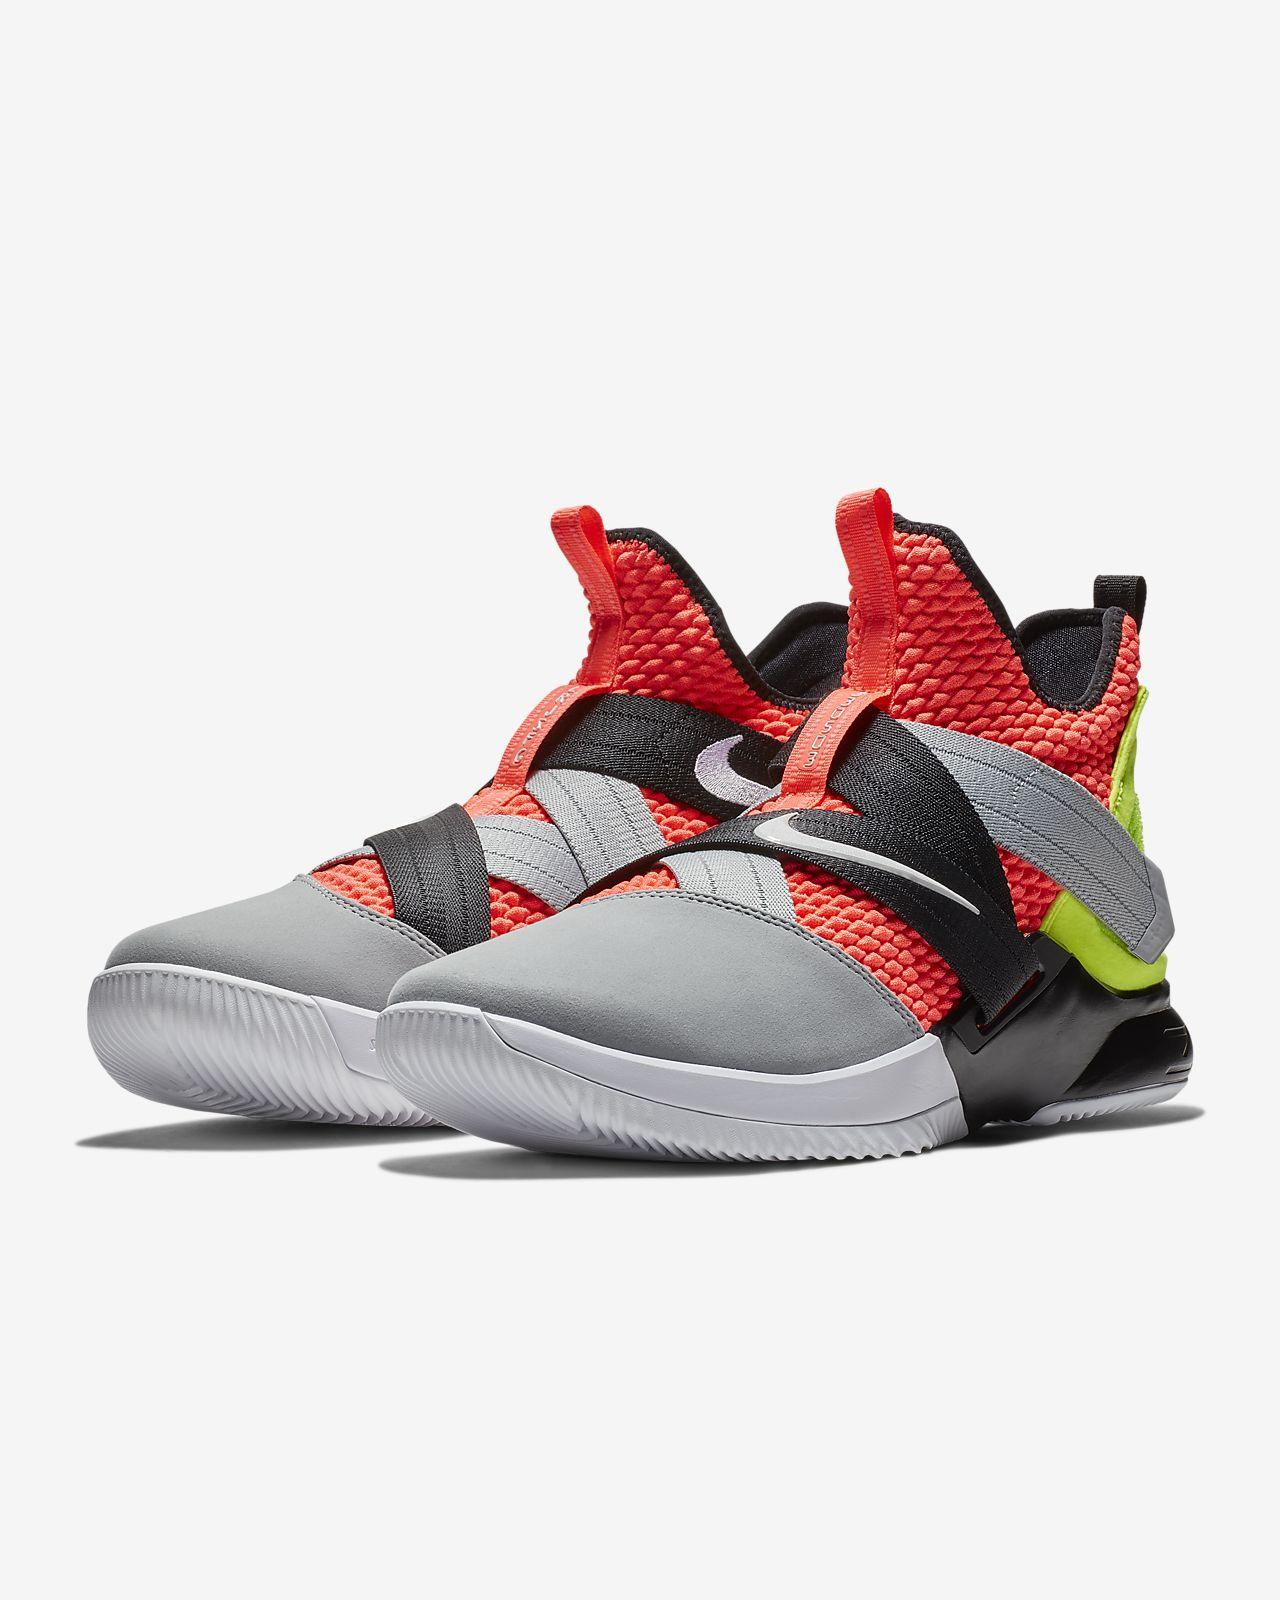 2a16b6d9582 LeBron Soldier 12 SFG Basketball Shoe. Nike.com